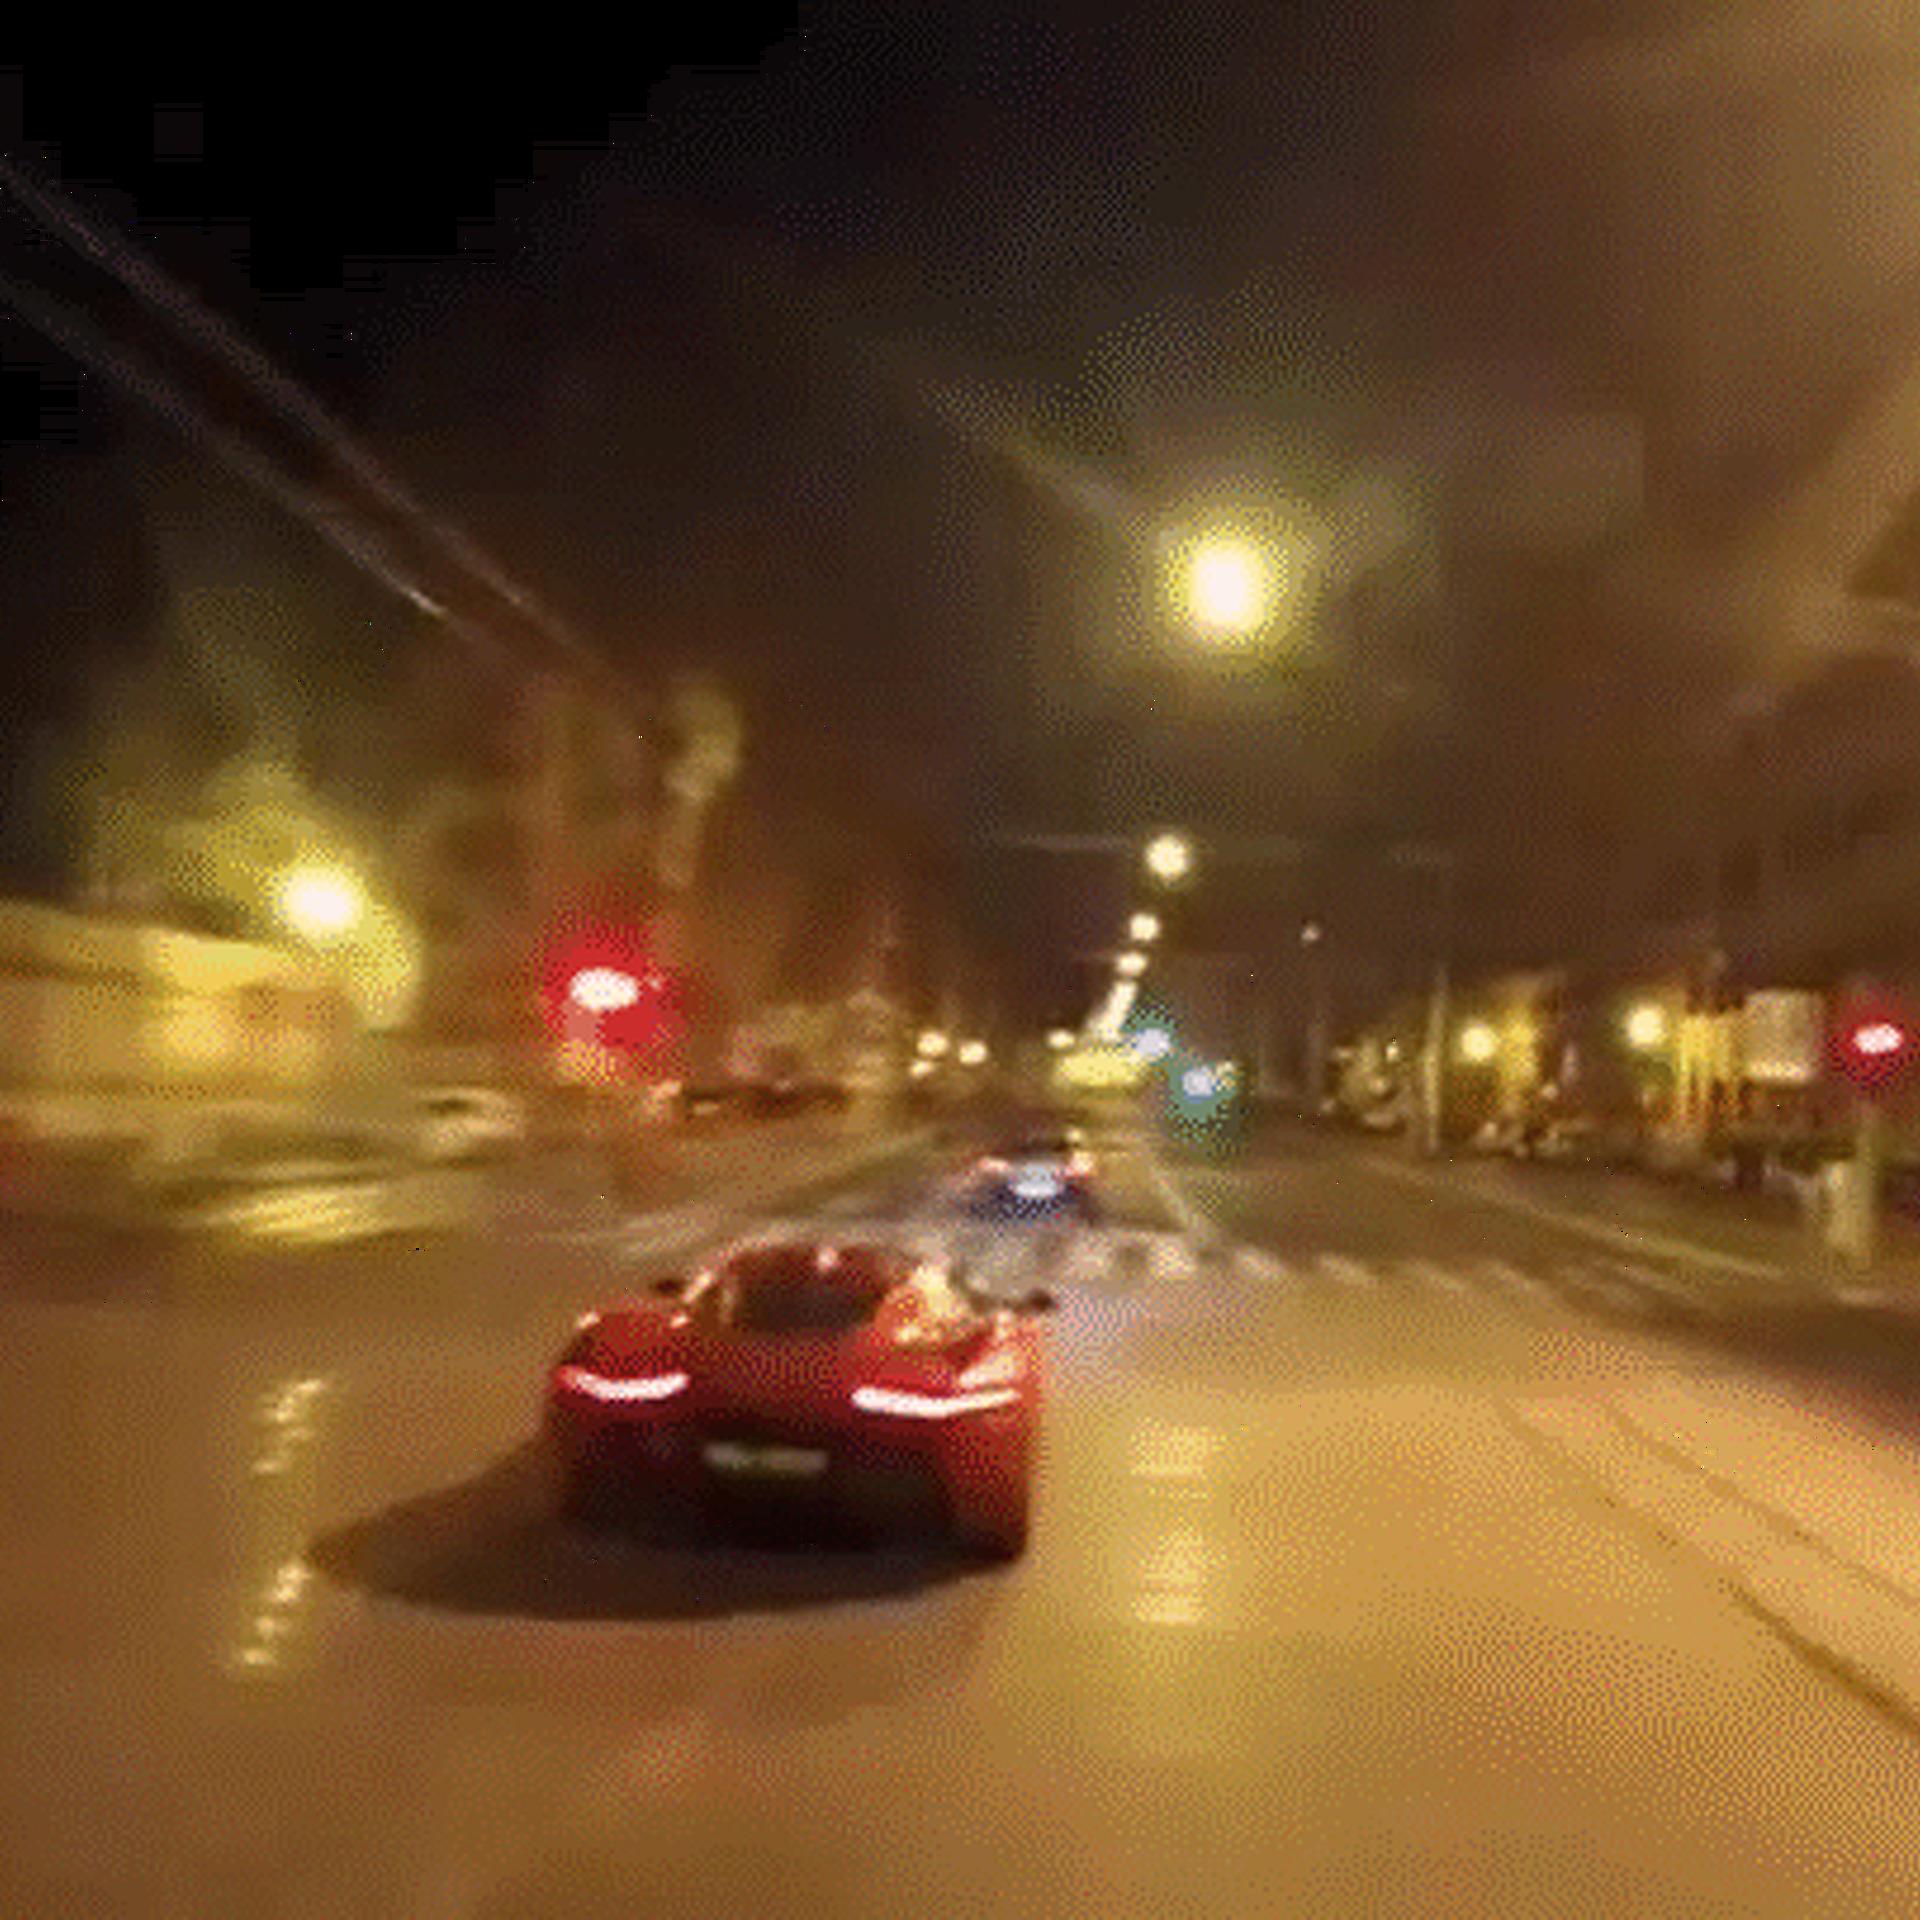 Aston Martin Db10 Vs Jaguar C X75 Which Bond Car Is Bolder Motor1 Com Photos